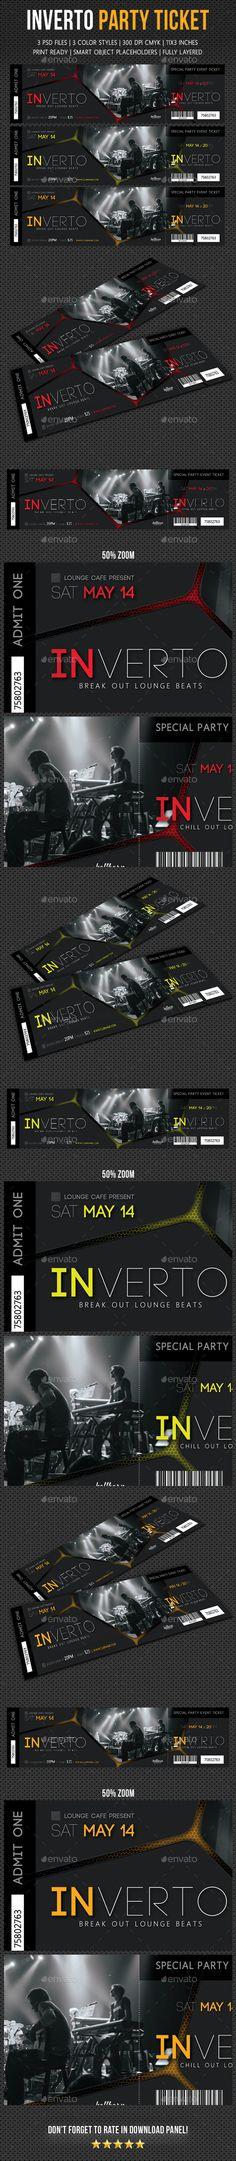 event ticket template Tickets Pinterest Event ticket and - free event ticket template